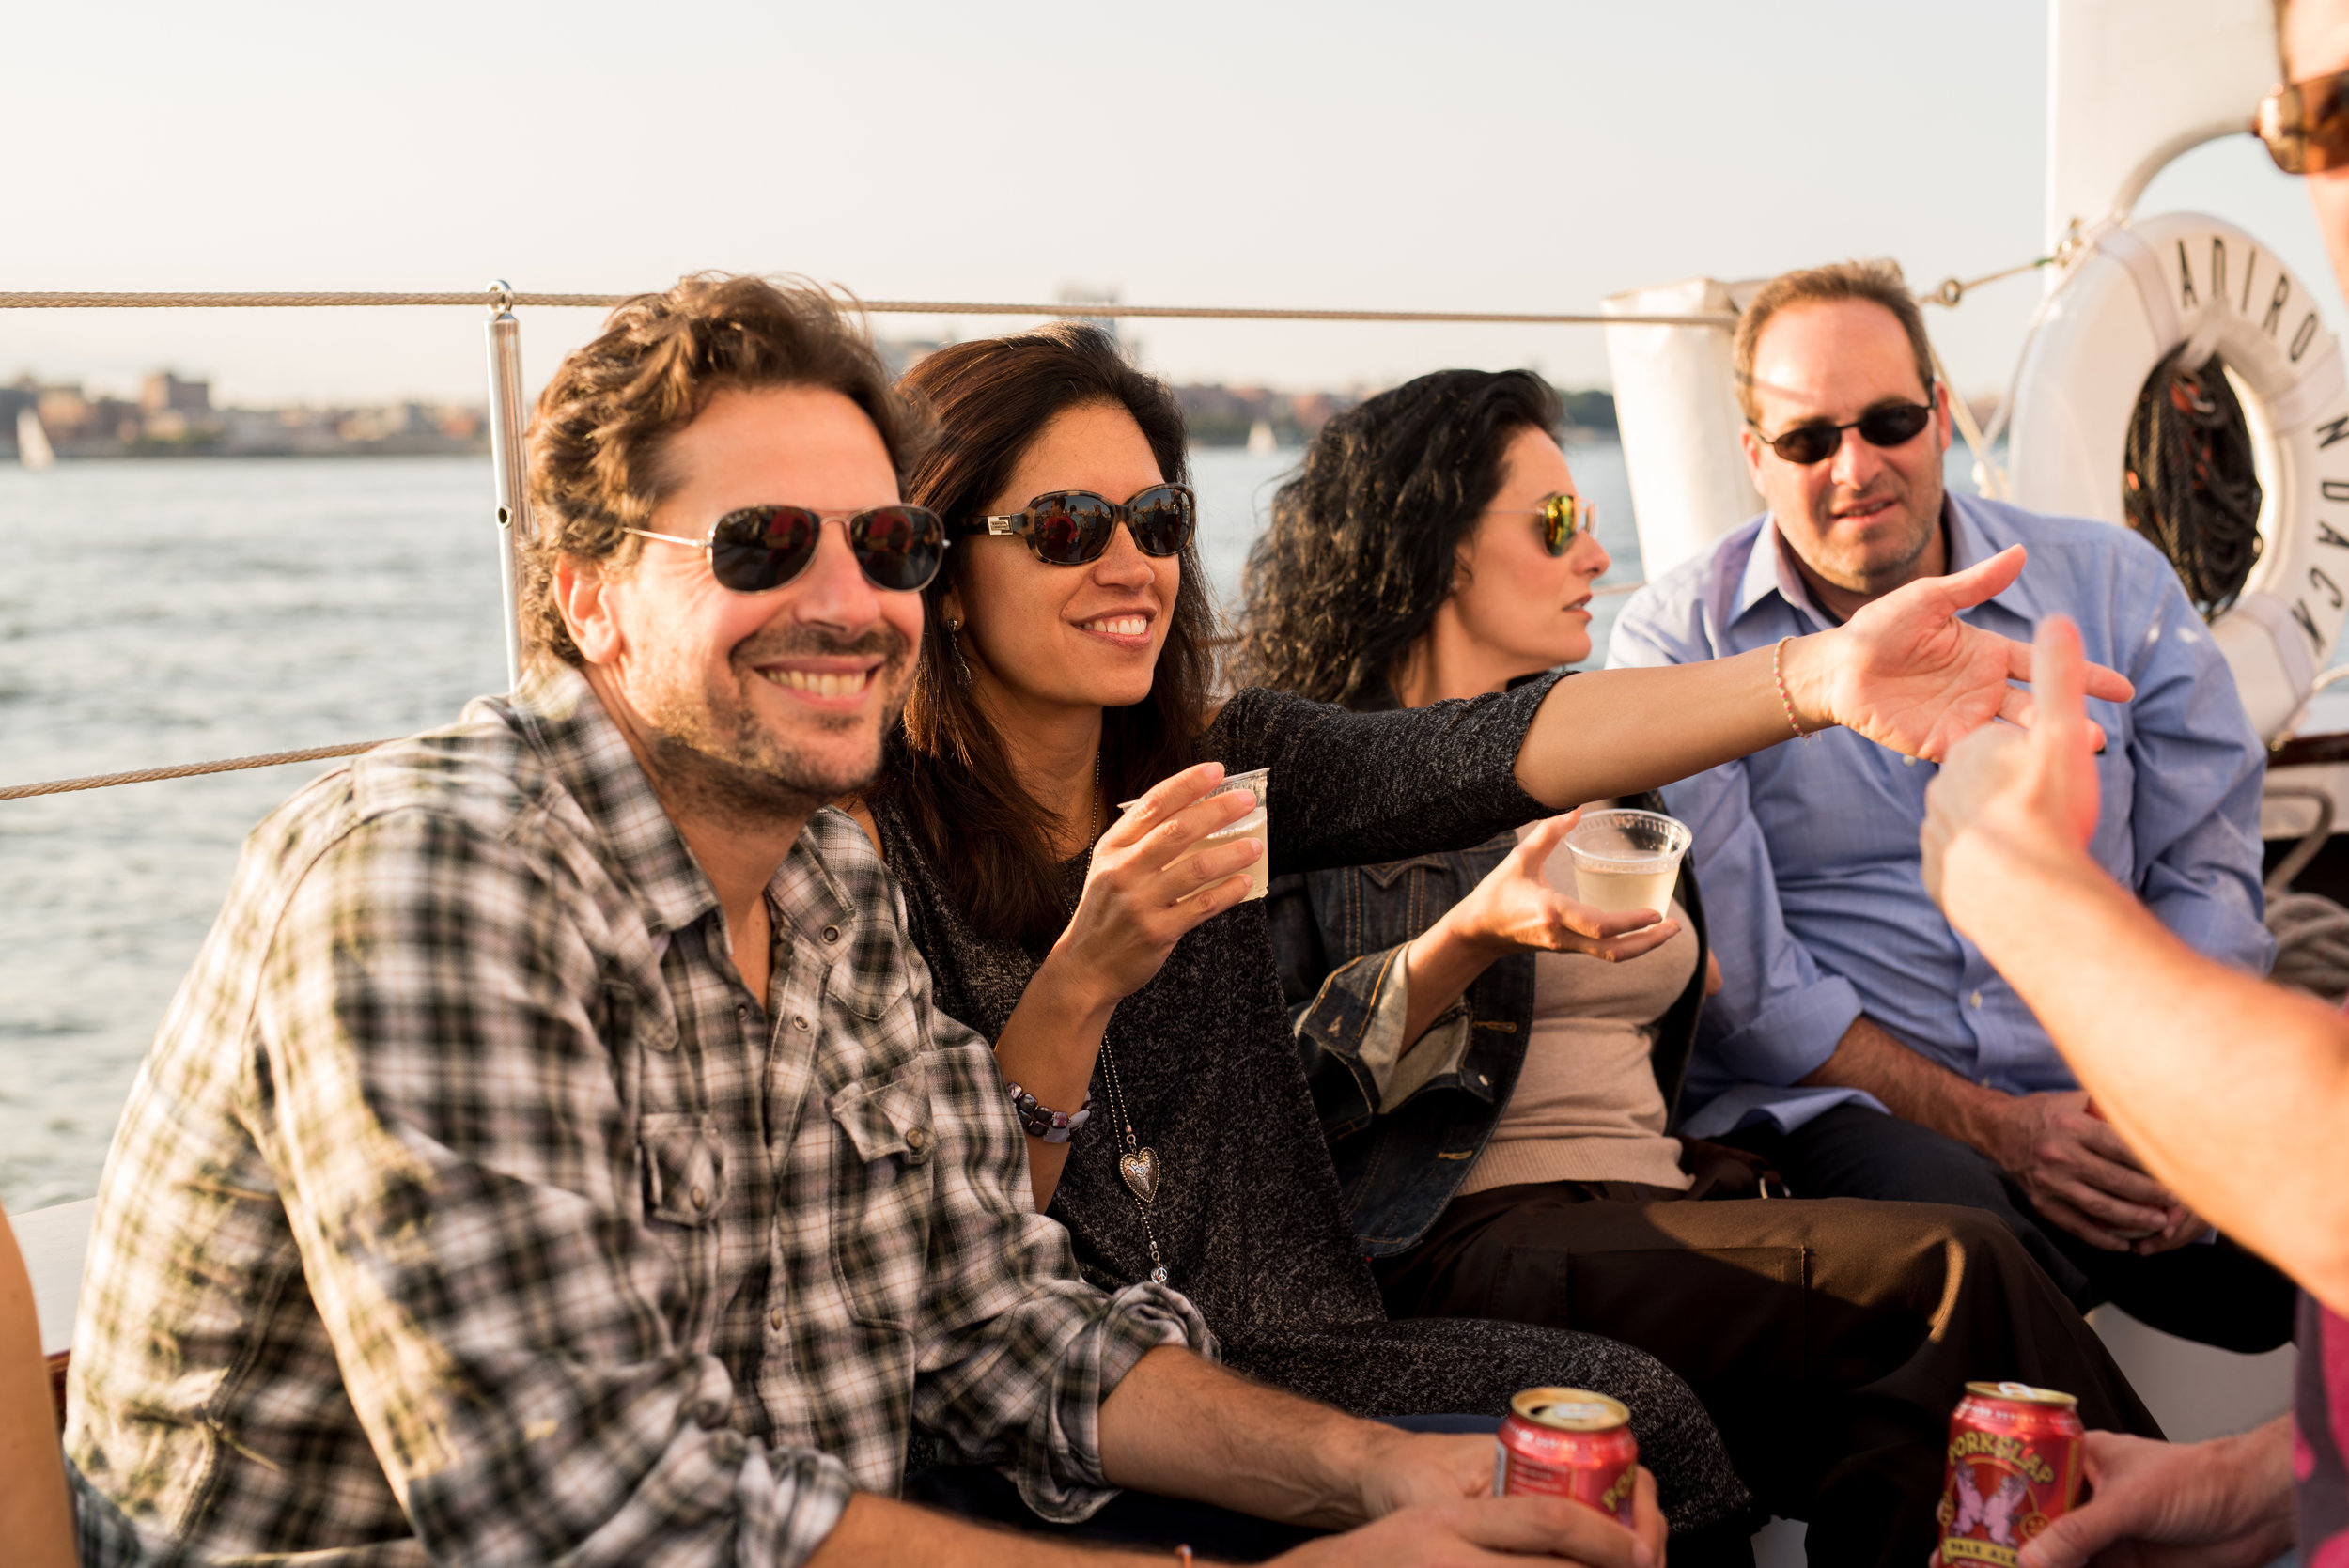 Mike's 50th Birthday- Adirondack Cruise on Hudson River- New York City- Olivia Christina Photo-46.JPG